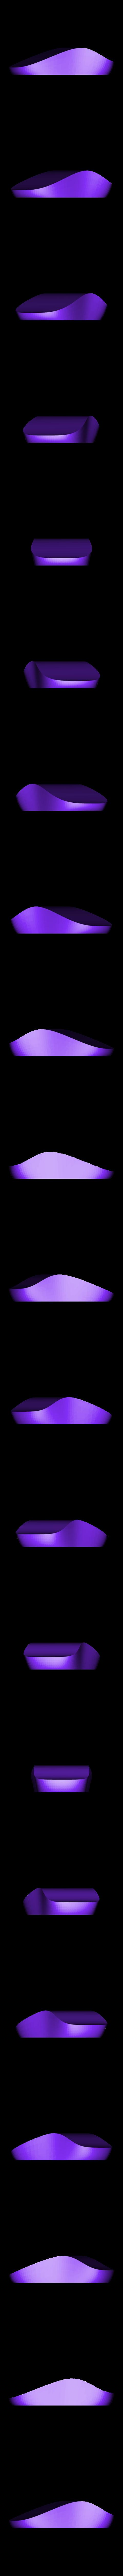 V3_mouse_base.STL Download free STL file Multi-Color Computer Mouse Model: Industrial/Product Design • 3D printable model, MosaicManufacturing